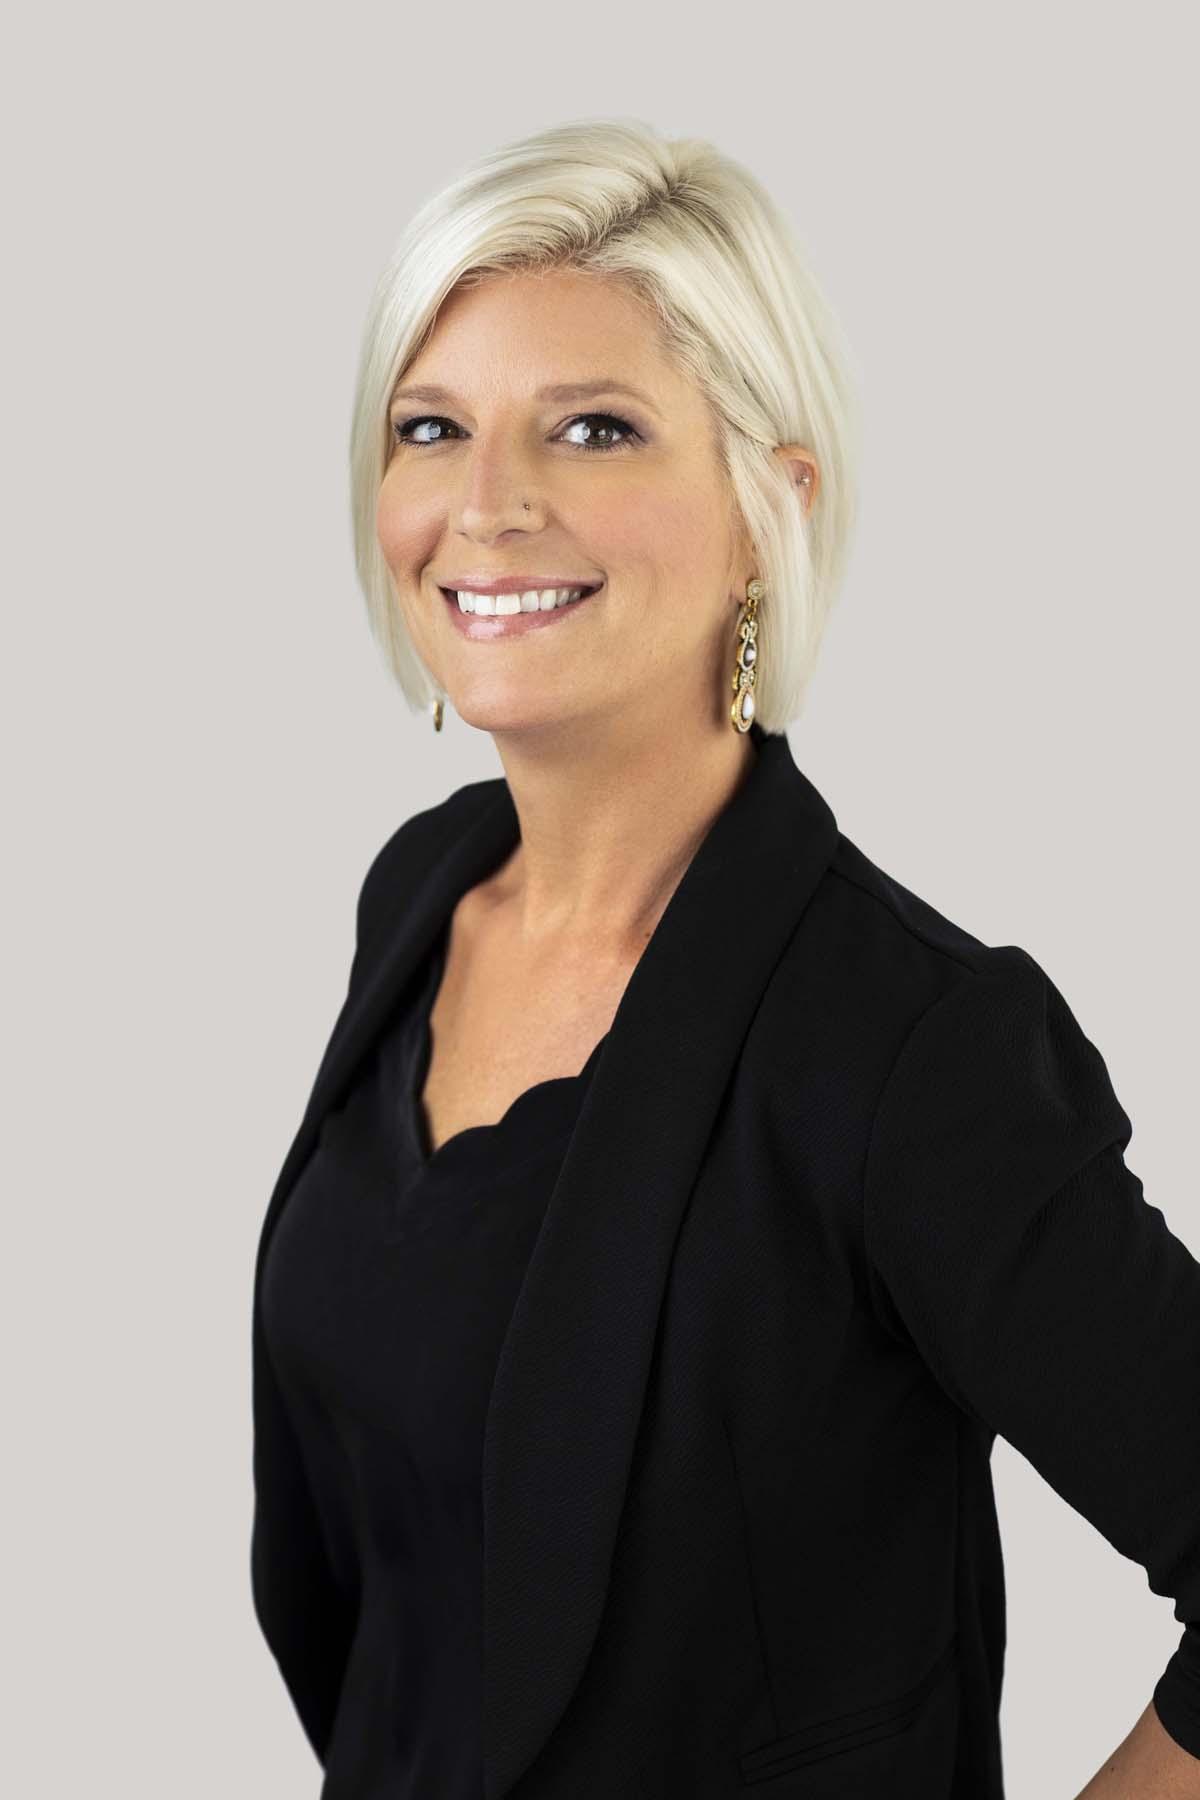 Melissa Langley